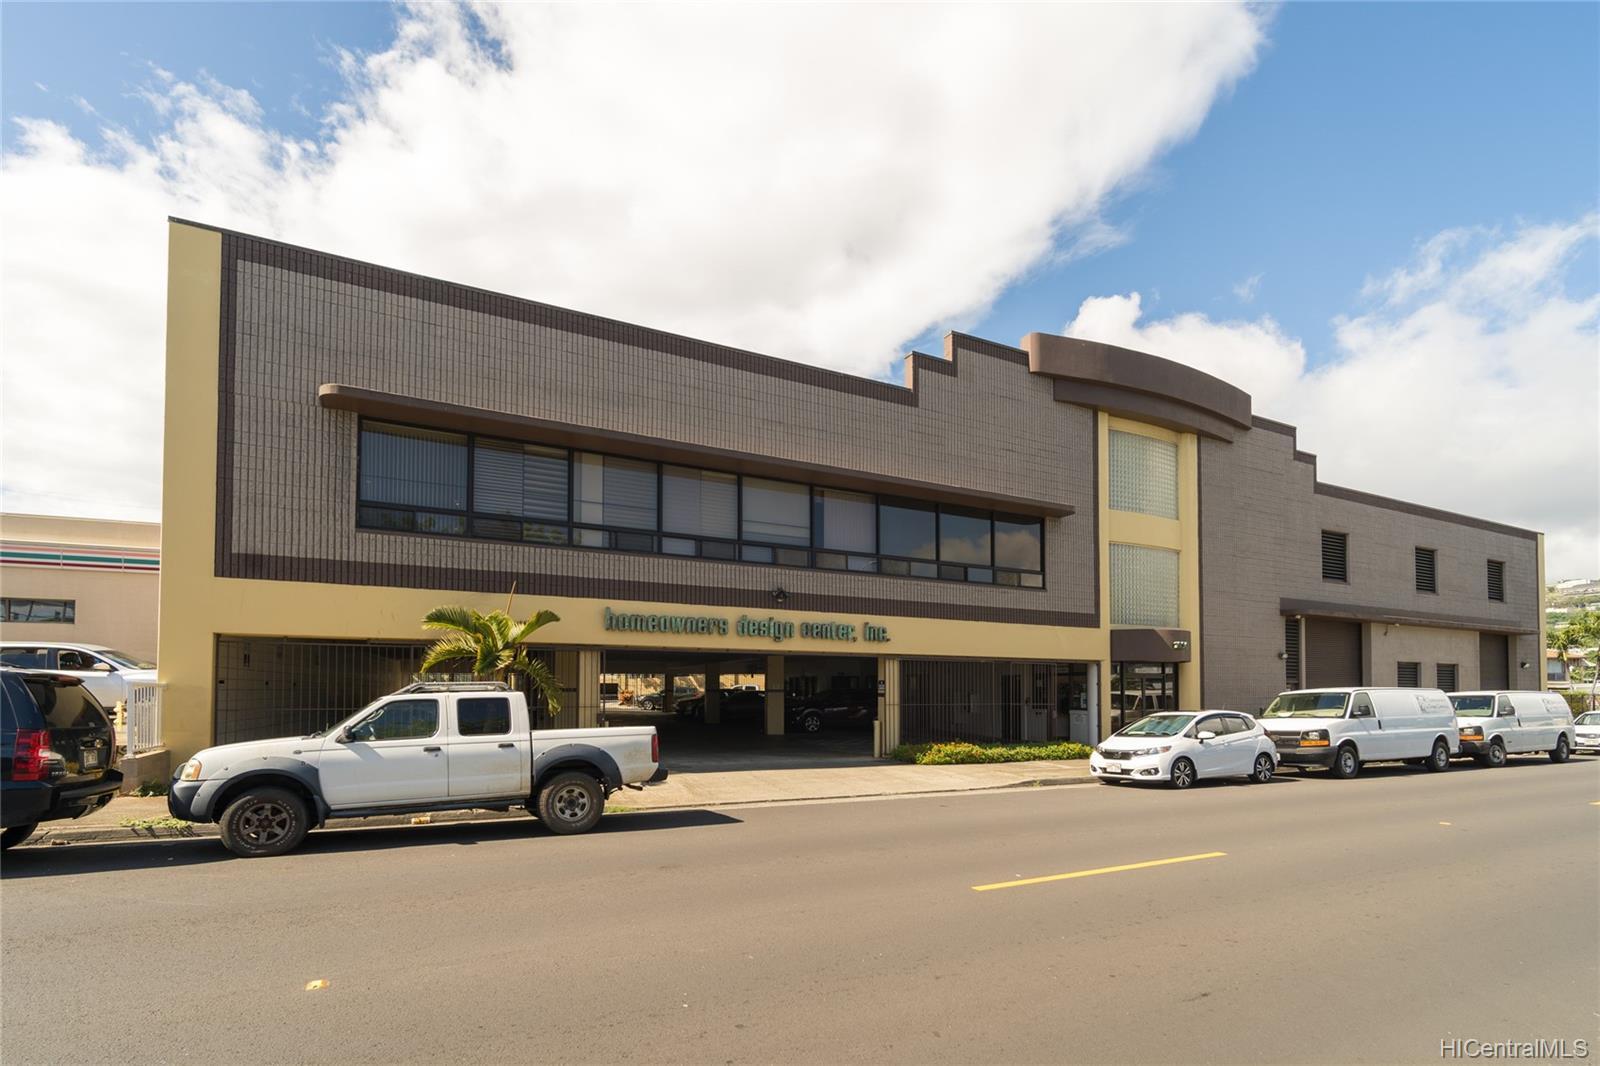 1030 Kohou Street Honolulu Oahu commercial real estate photo1 of 25